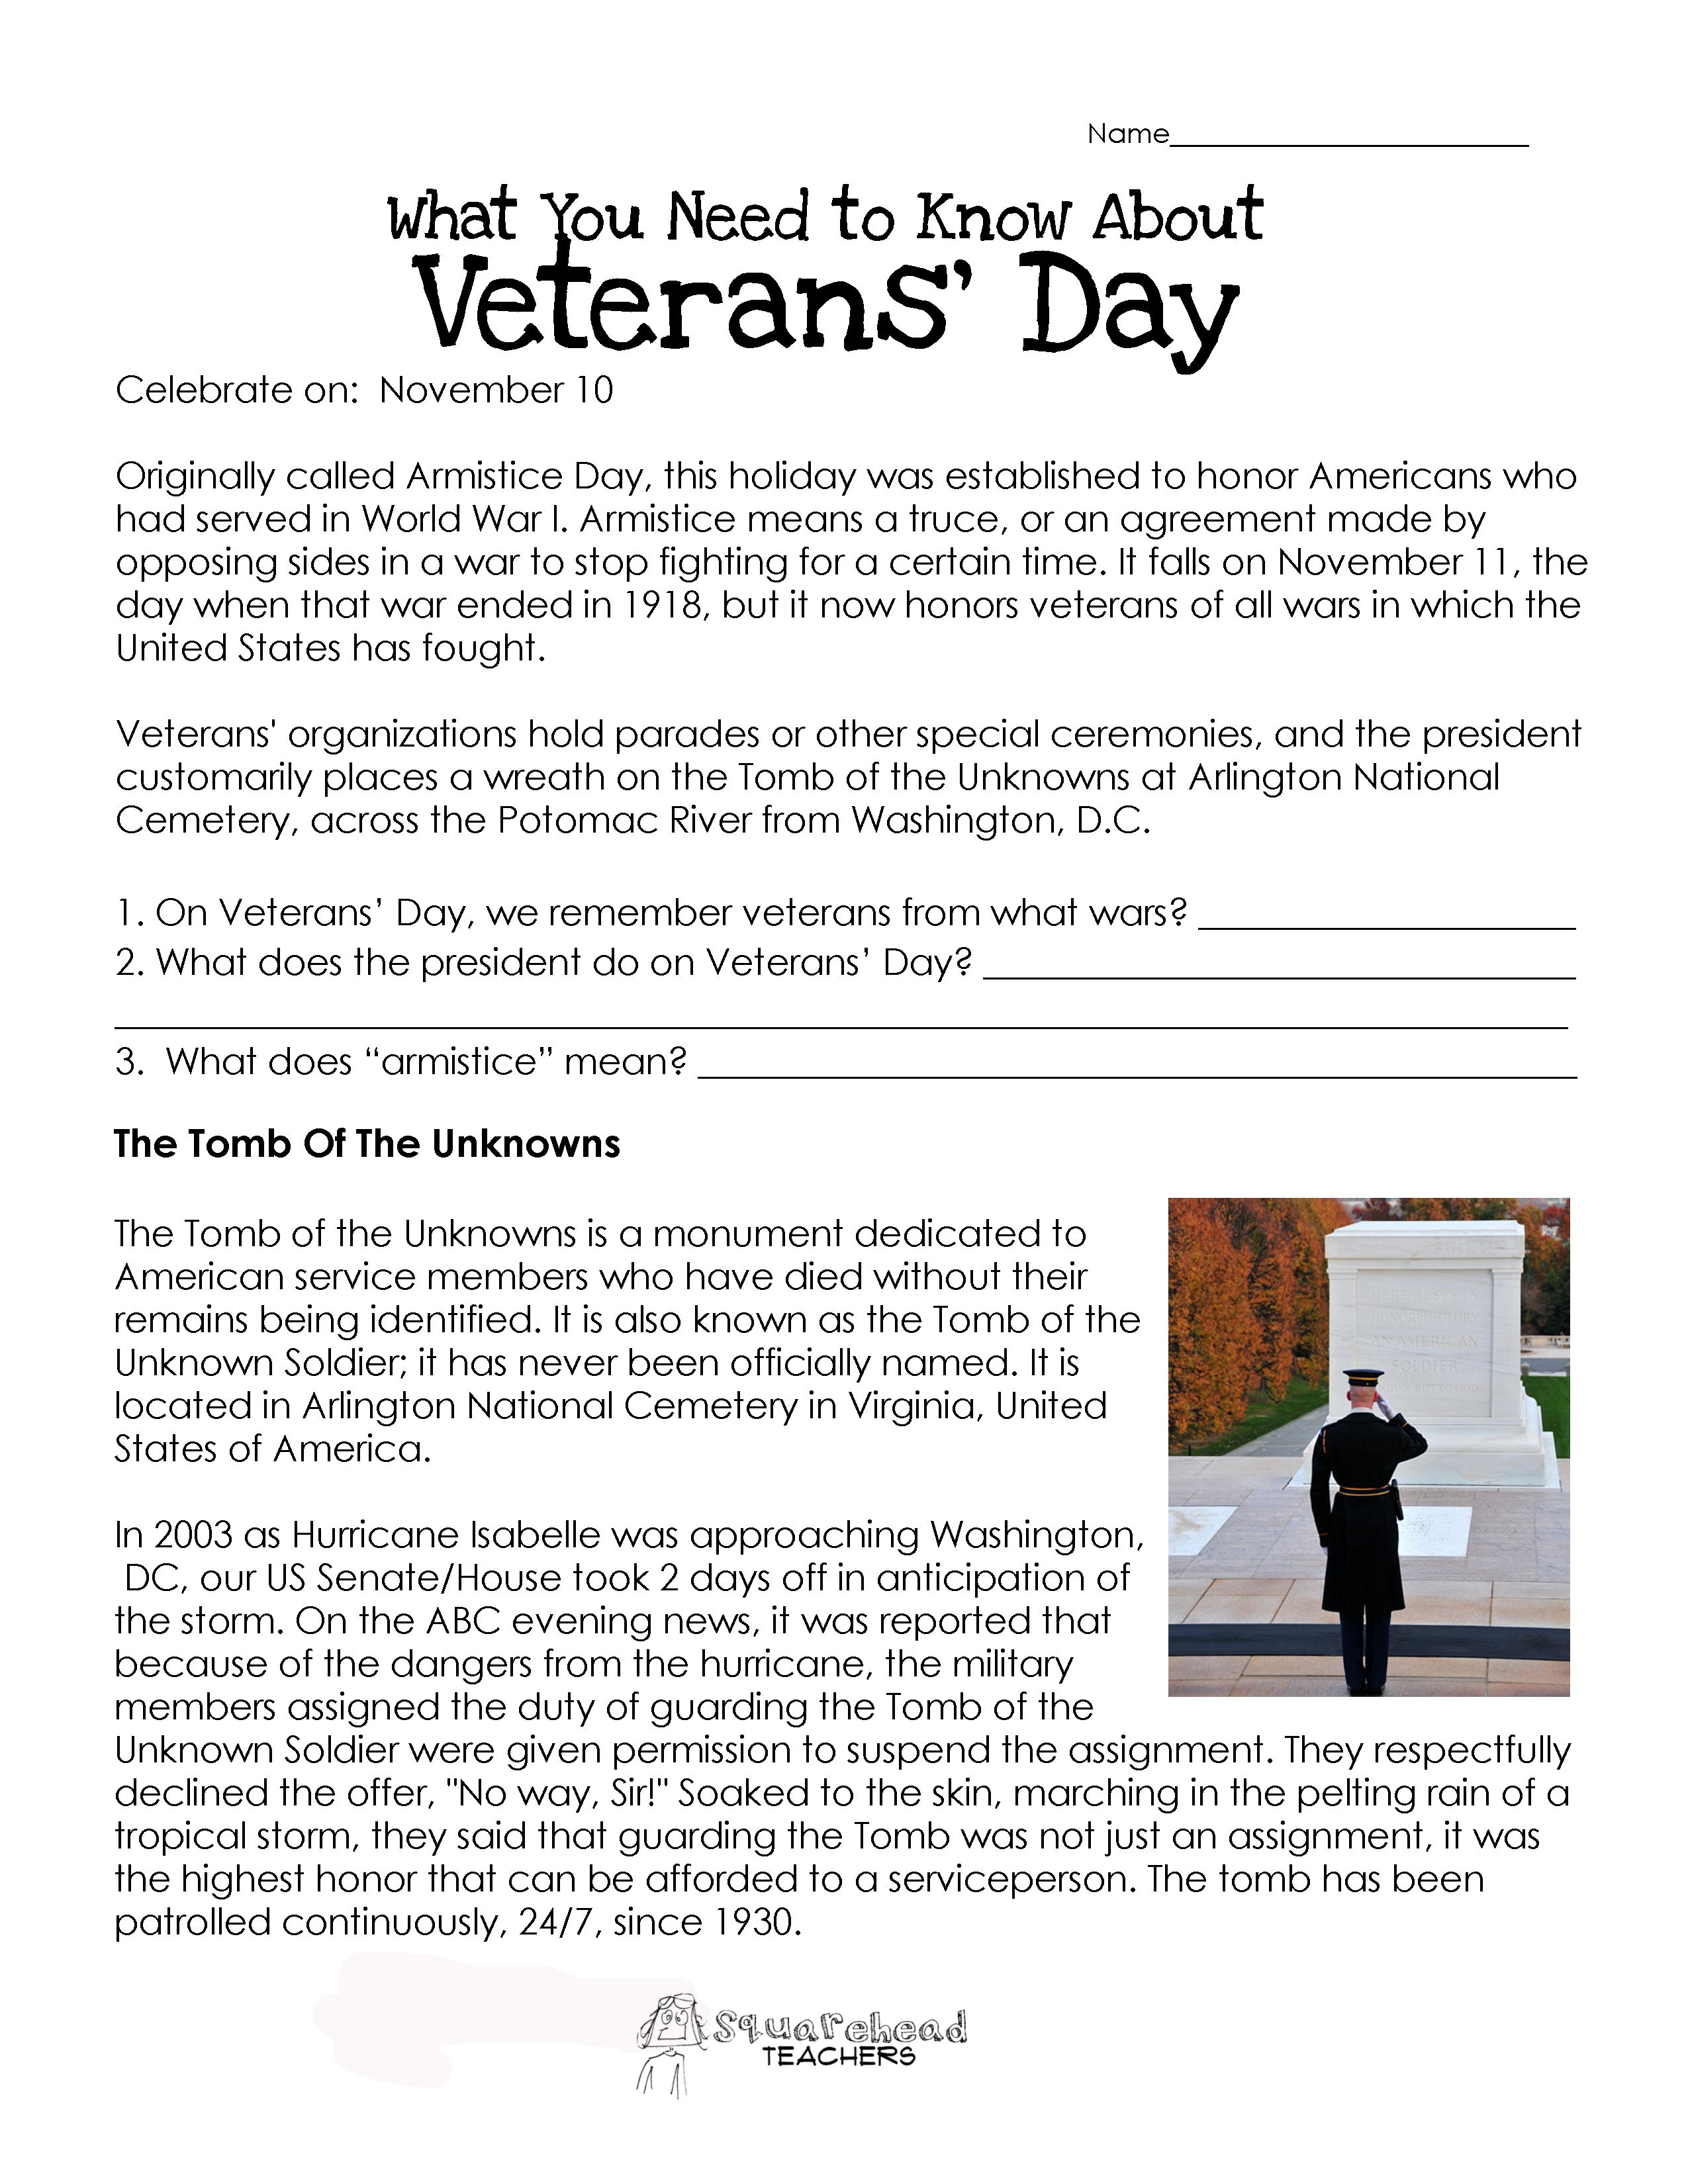 veterans day worksheets Veterans Day Worksheet – Free Veterans Day Worksheets